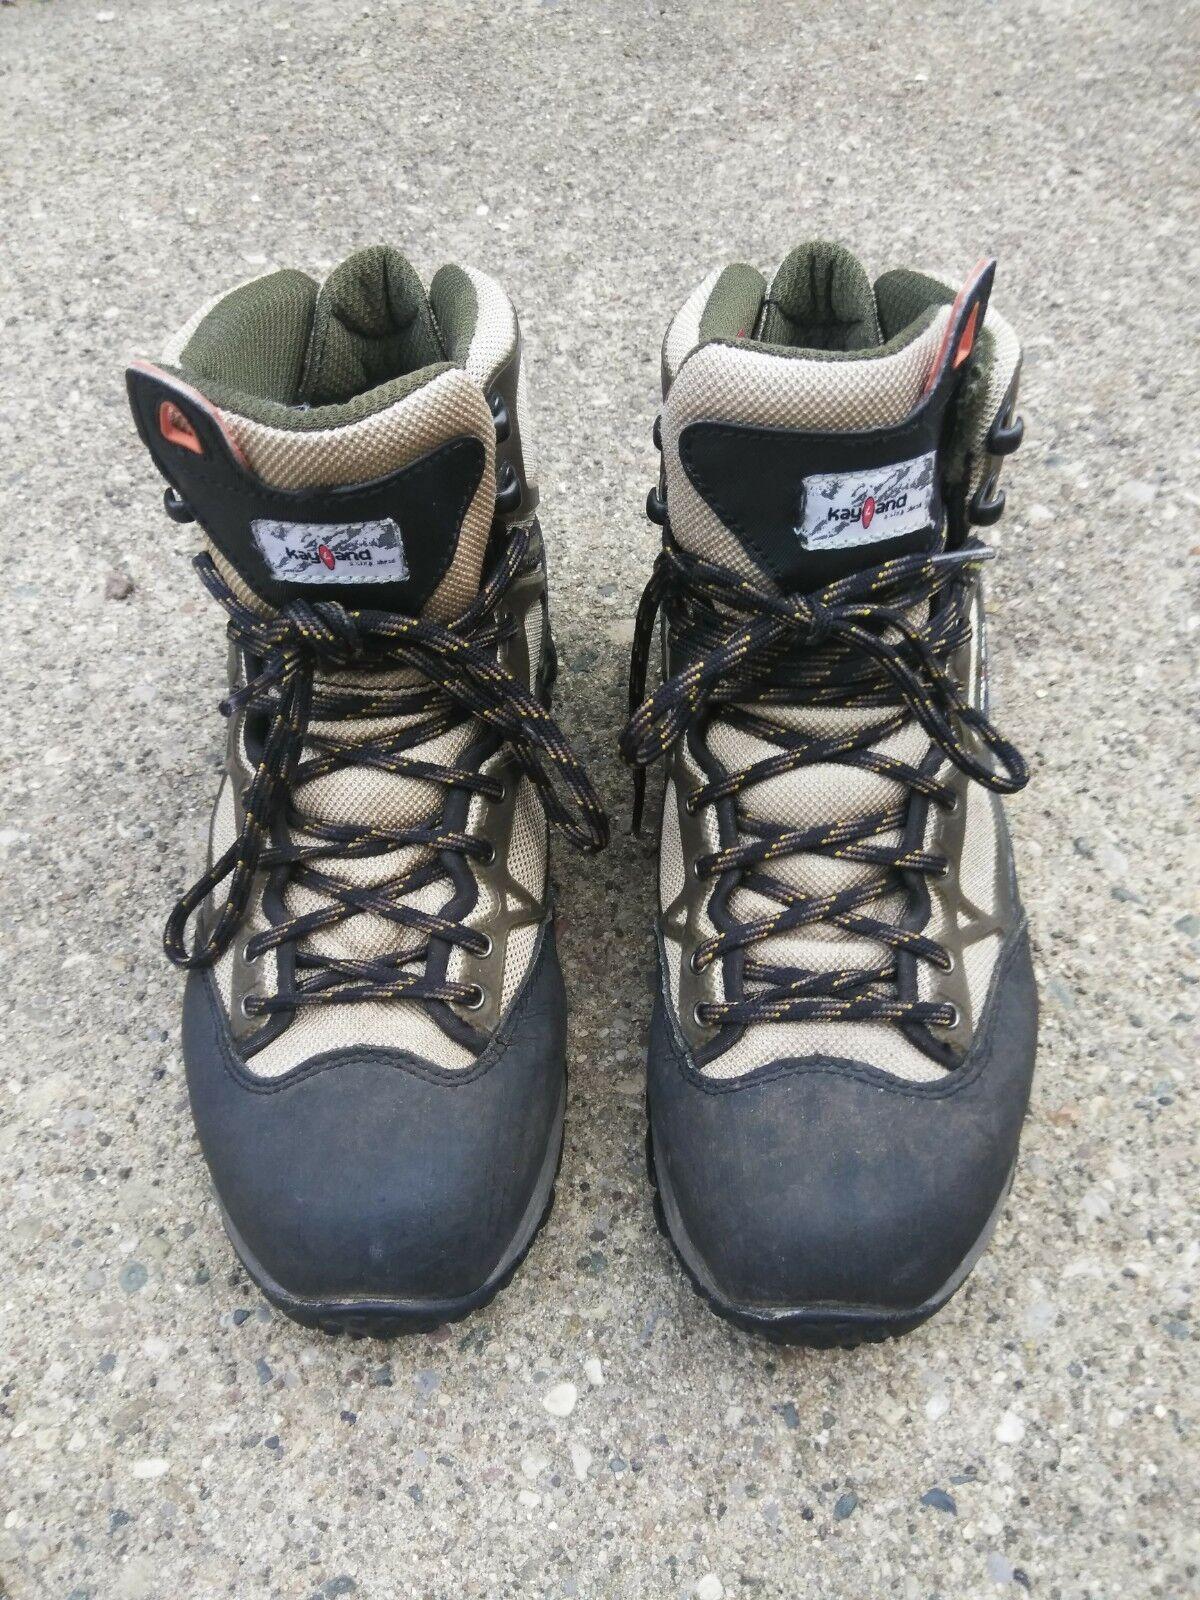 Kayland boots 8.0M 9.5 L.